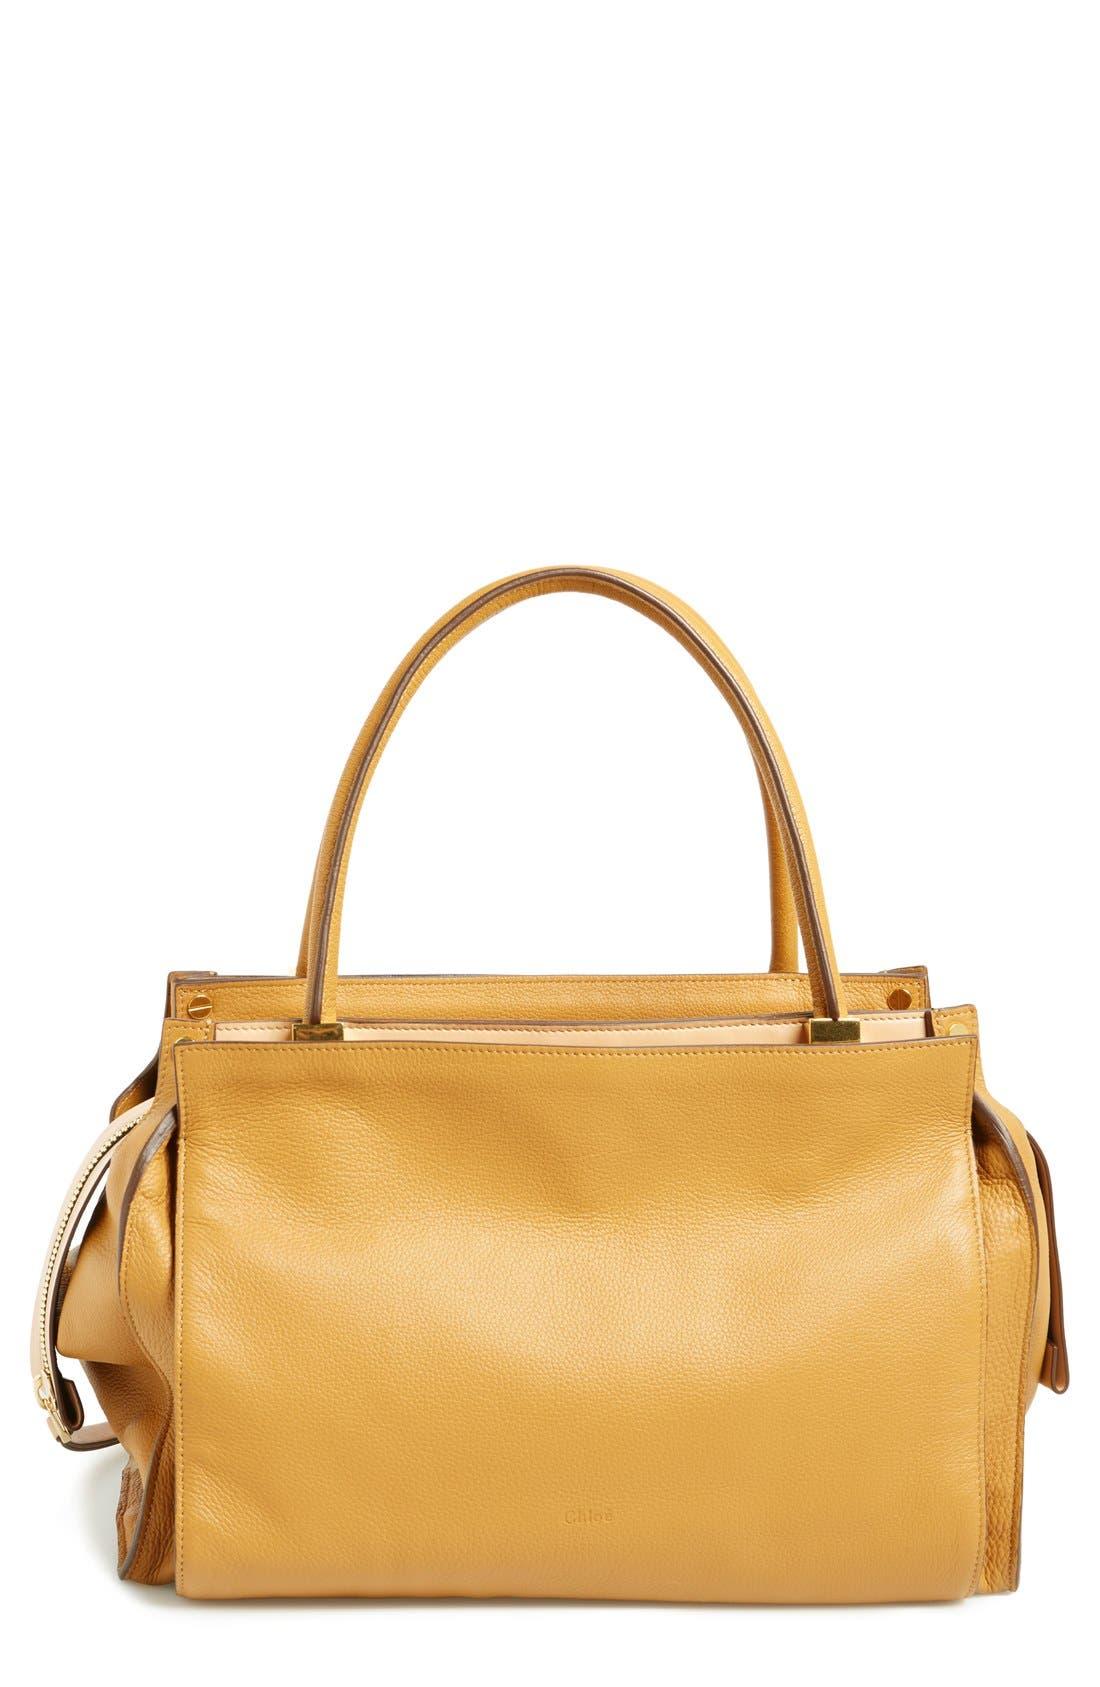 Alternate Image 1 Selected - Chloé 'Dree - Medium' Leather Satchel